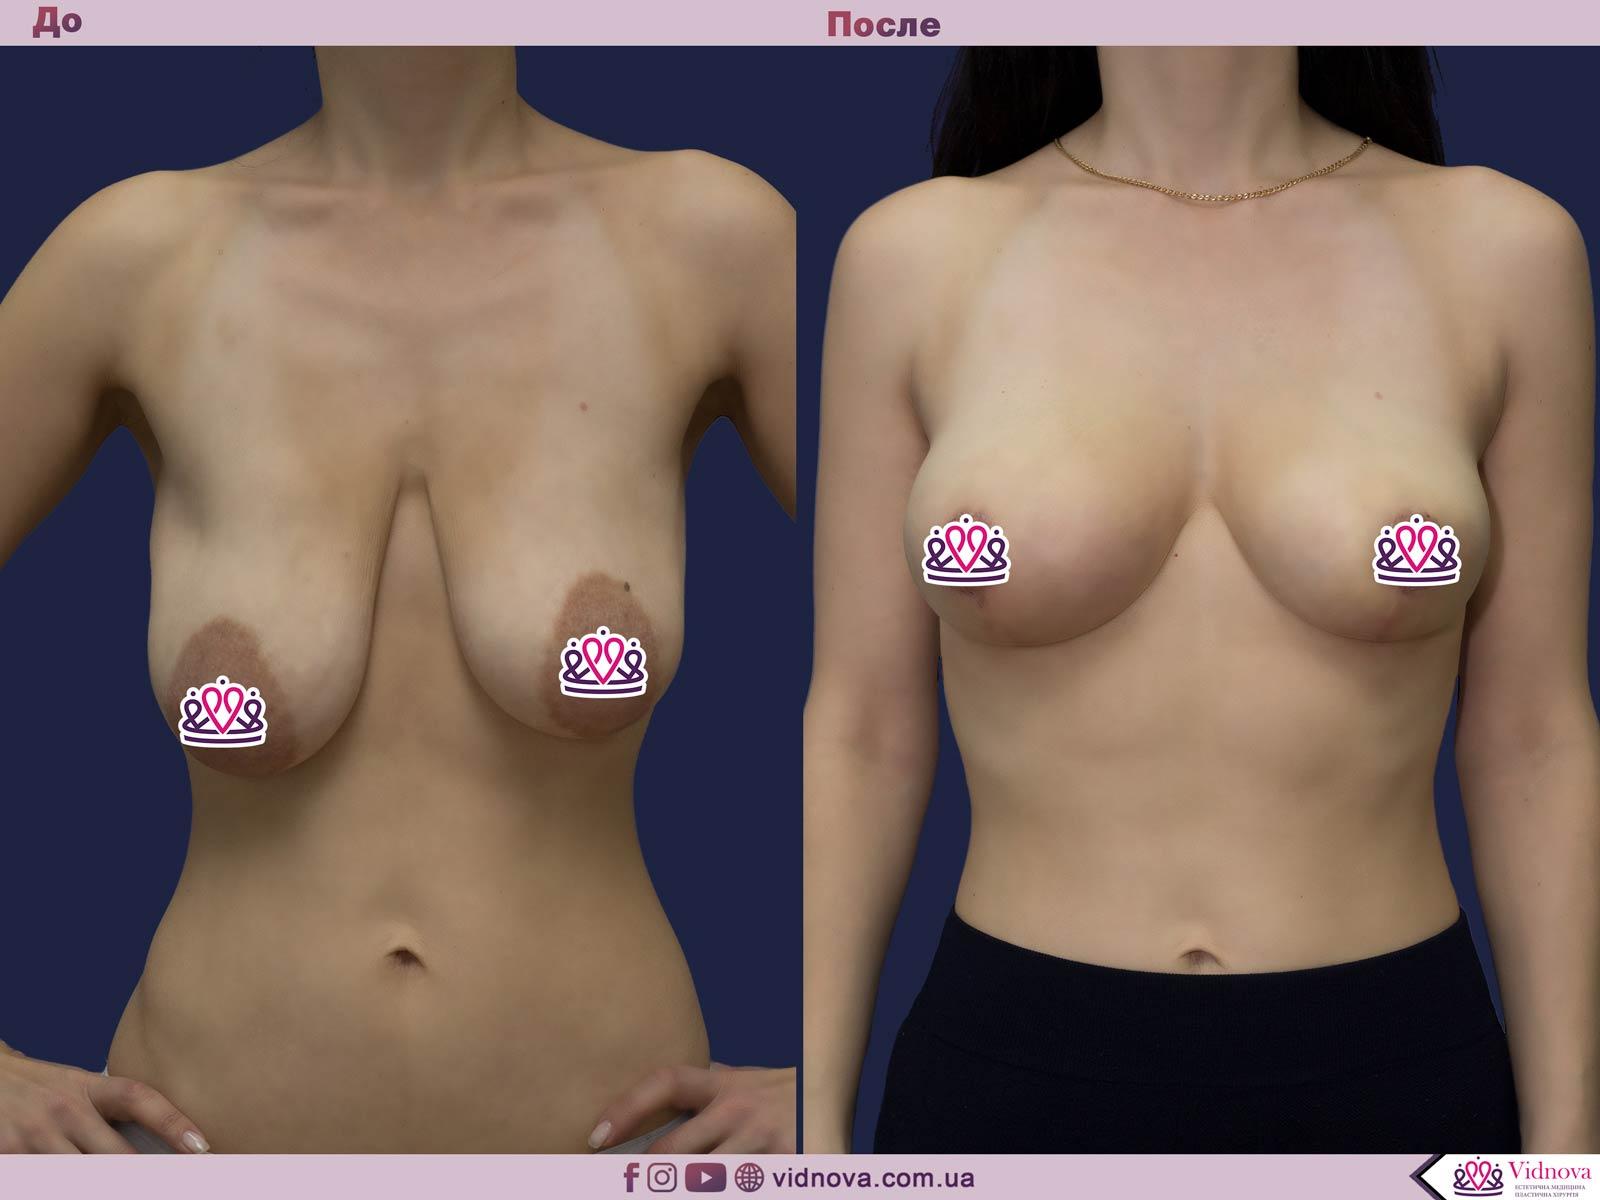 Подтяжка груди: Фото ДО и ПОСЛЕ - Пример №26-1 - Клиника Vidnova